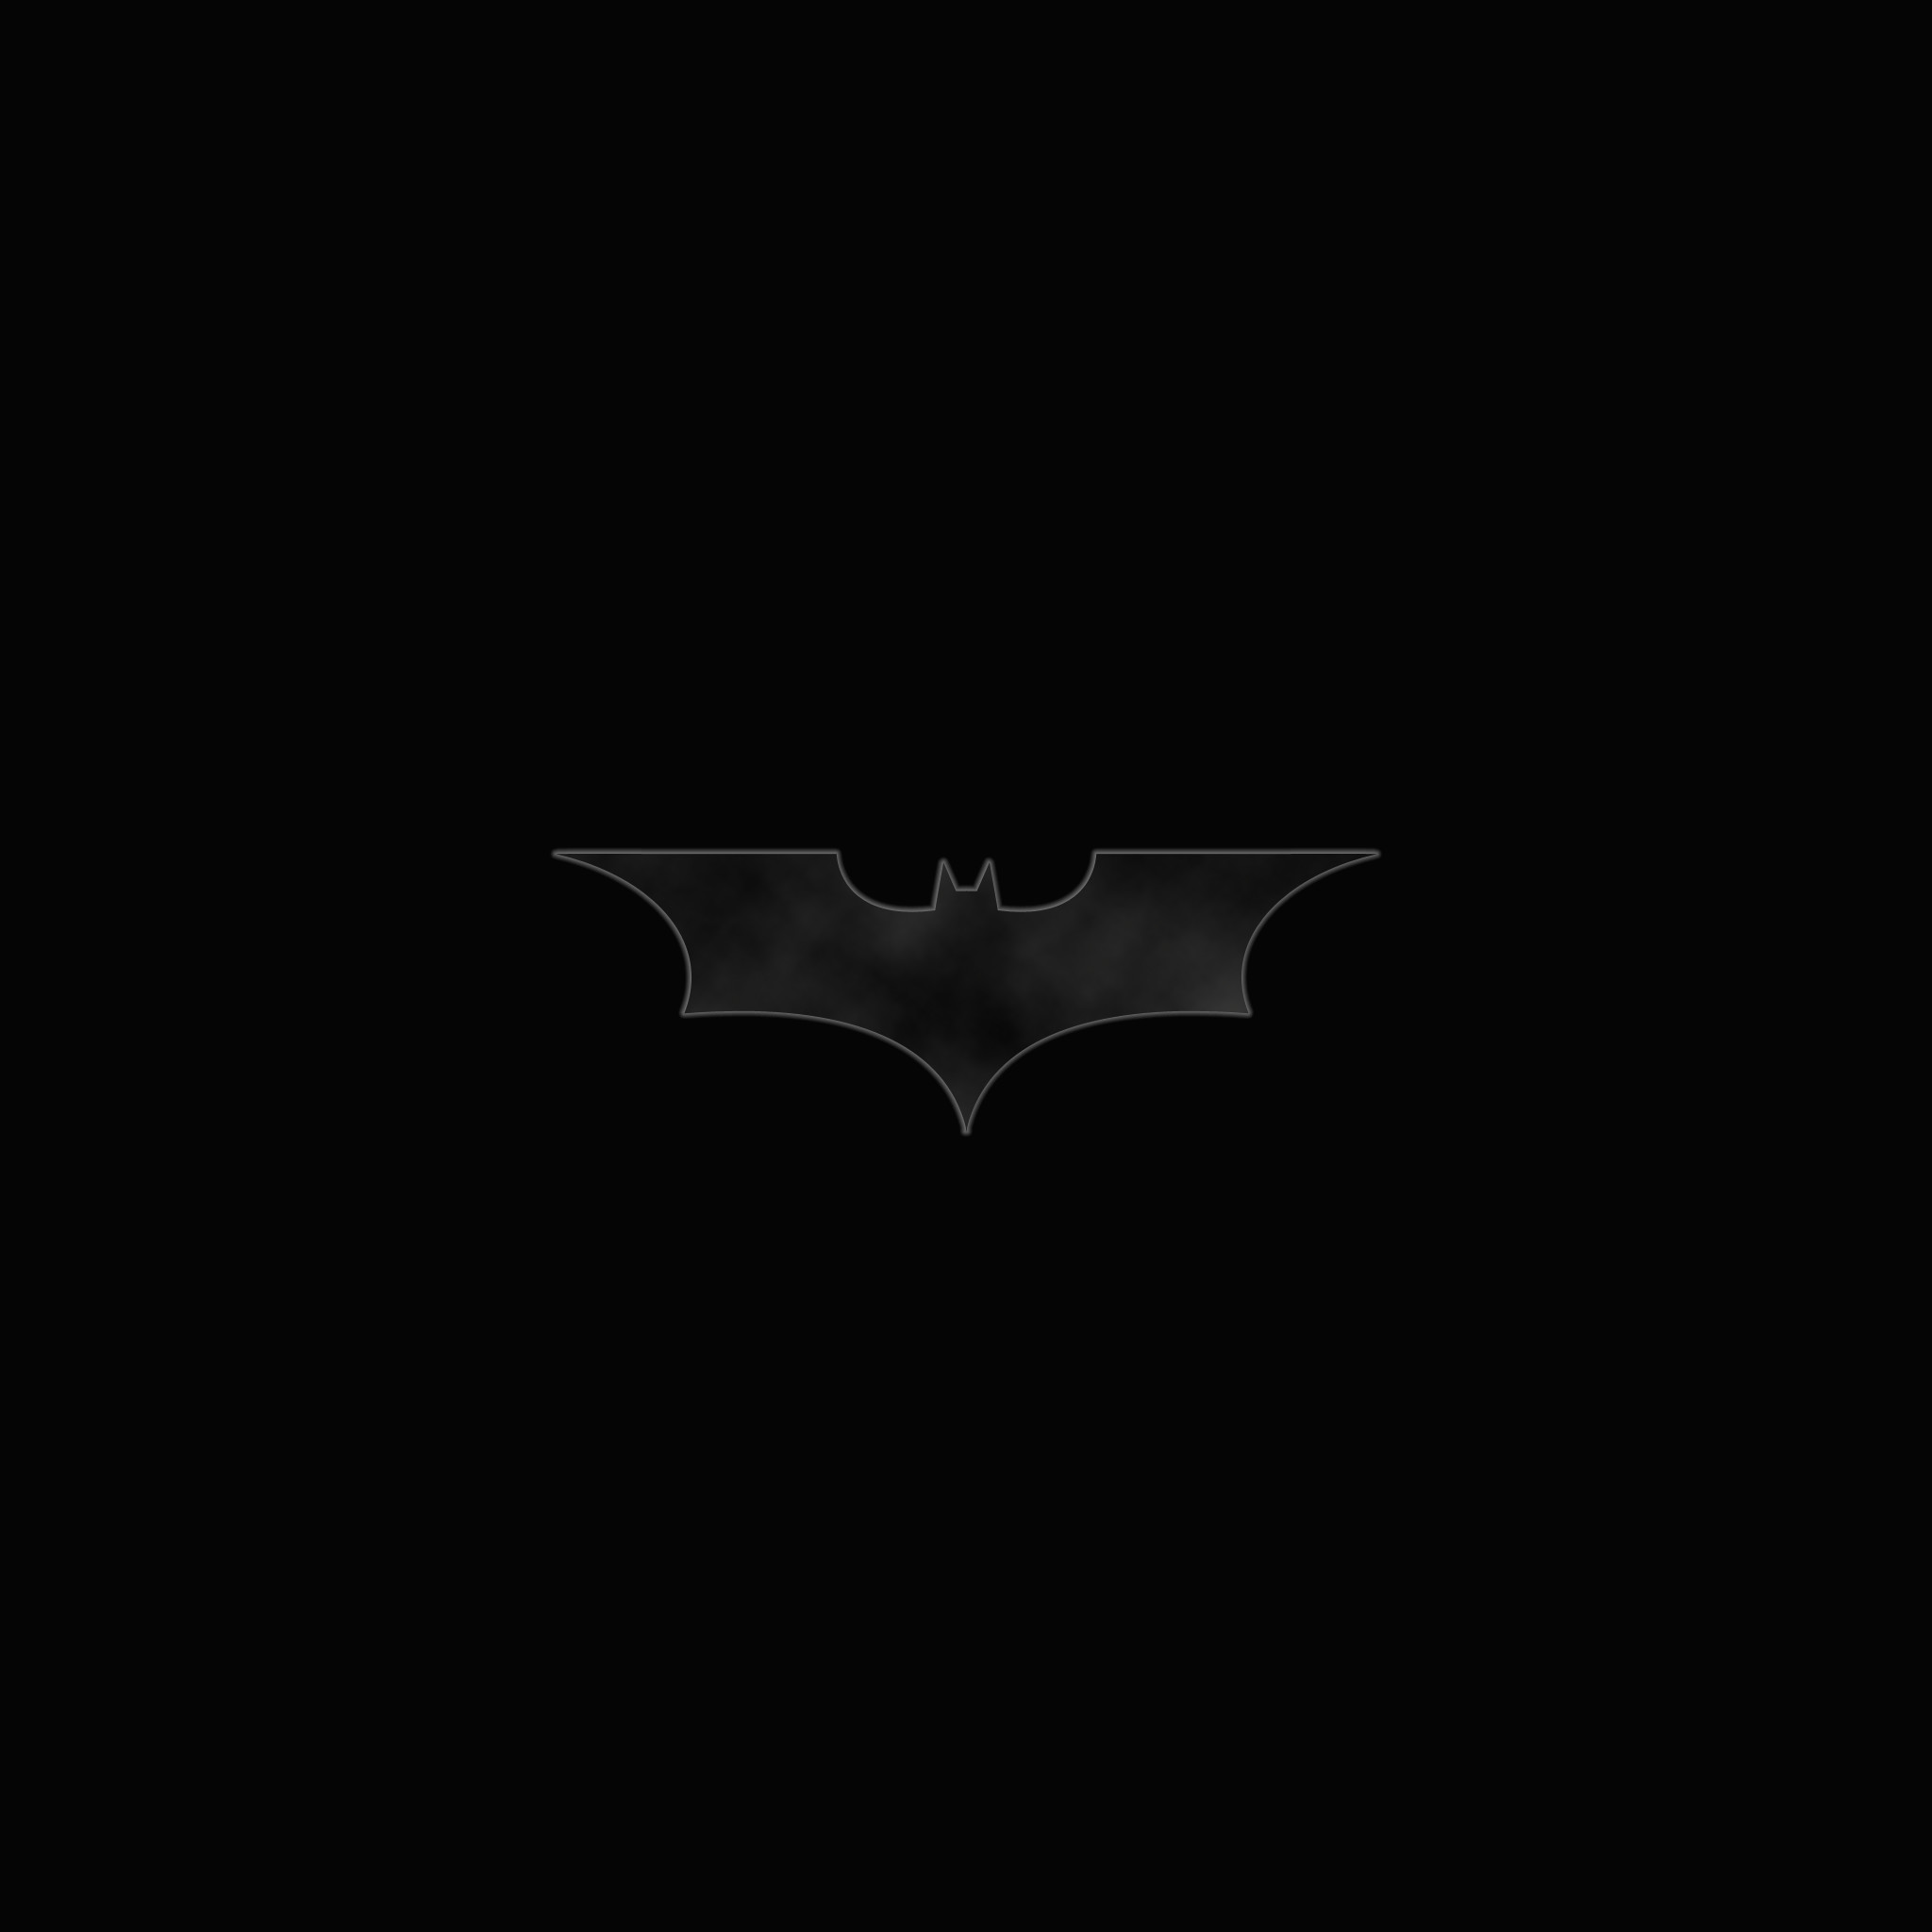 batman logo wallpaper 4k iphone